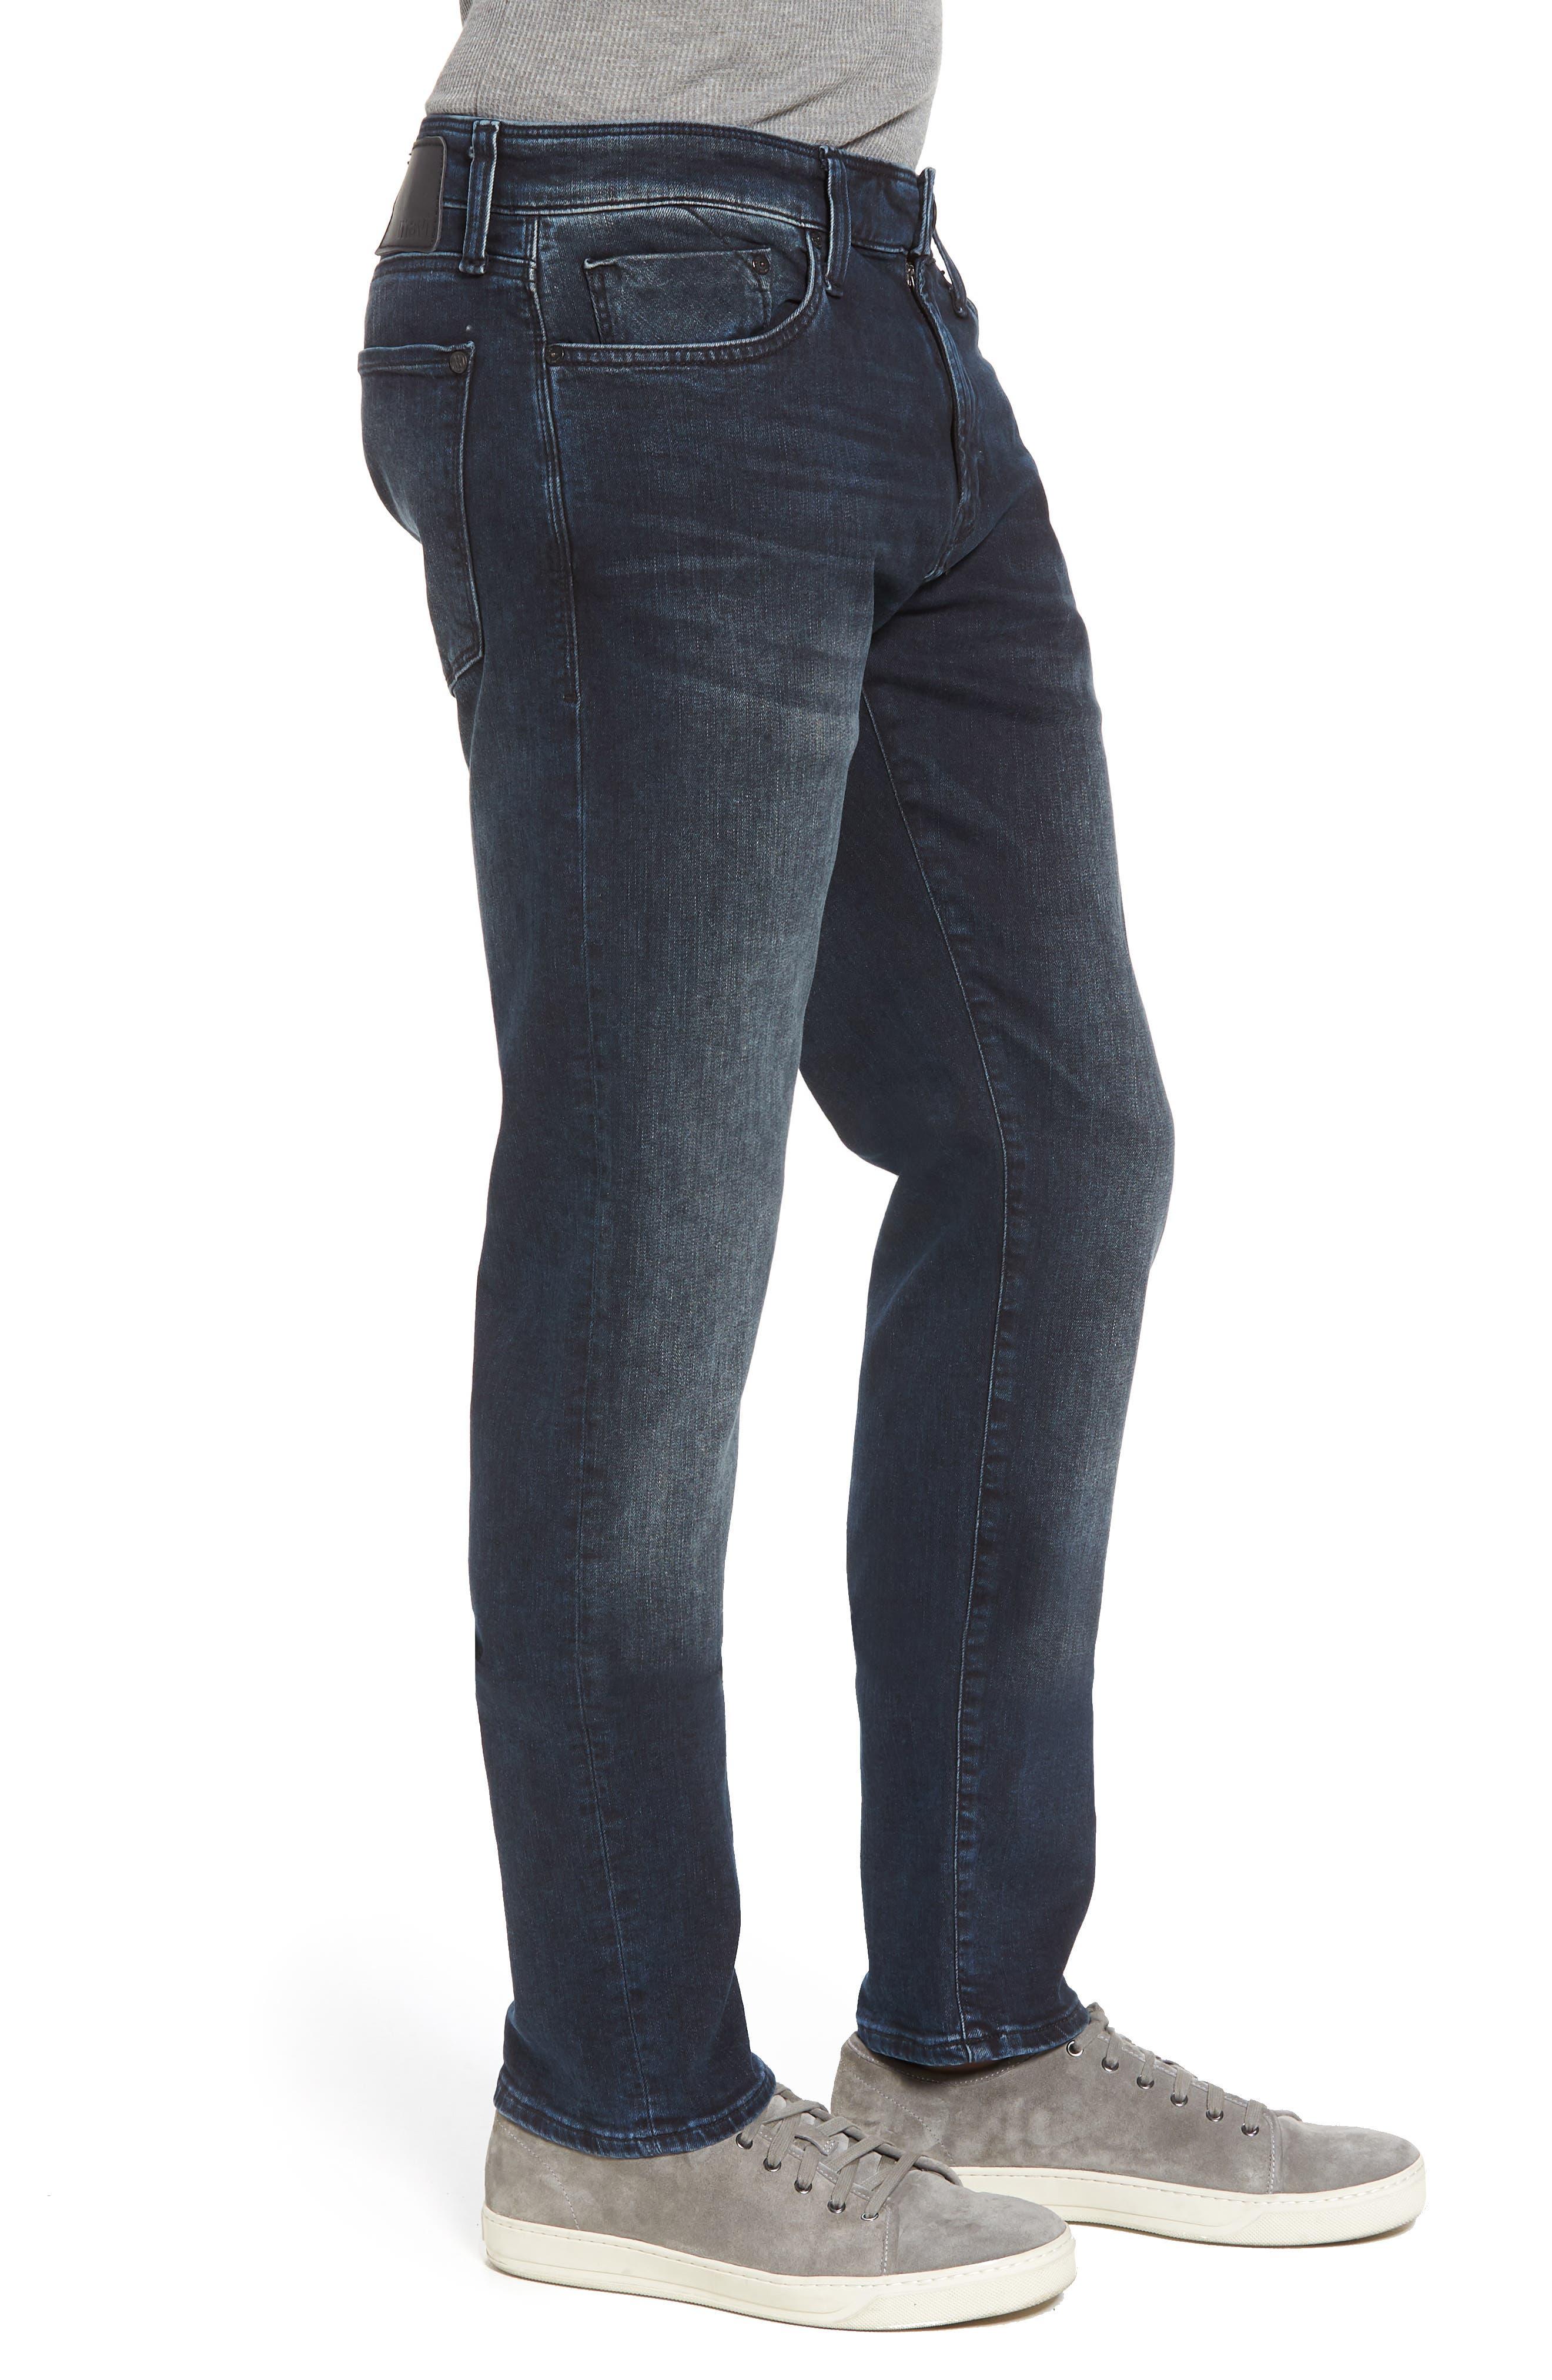 Jake Slim Fit Jeans,                             Alternate thumbnail 3, color,                             Ink Used Authentic Vintage